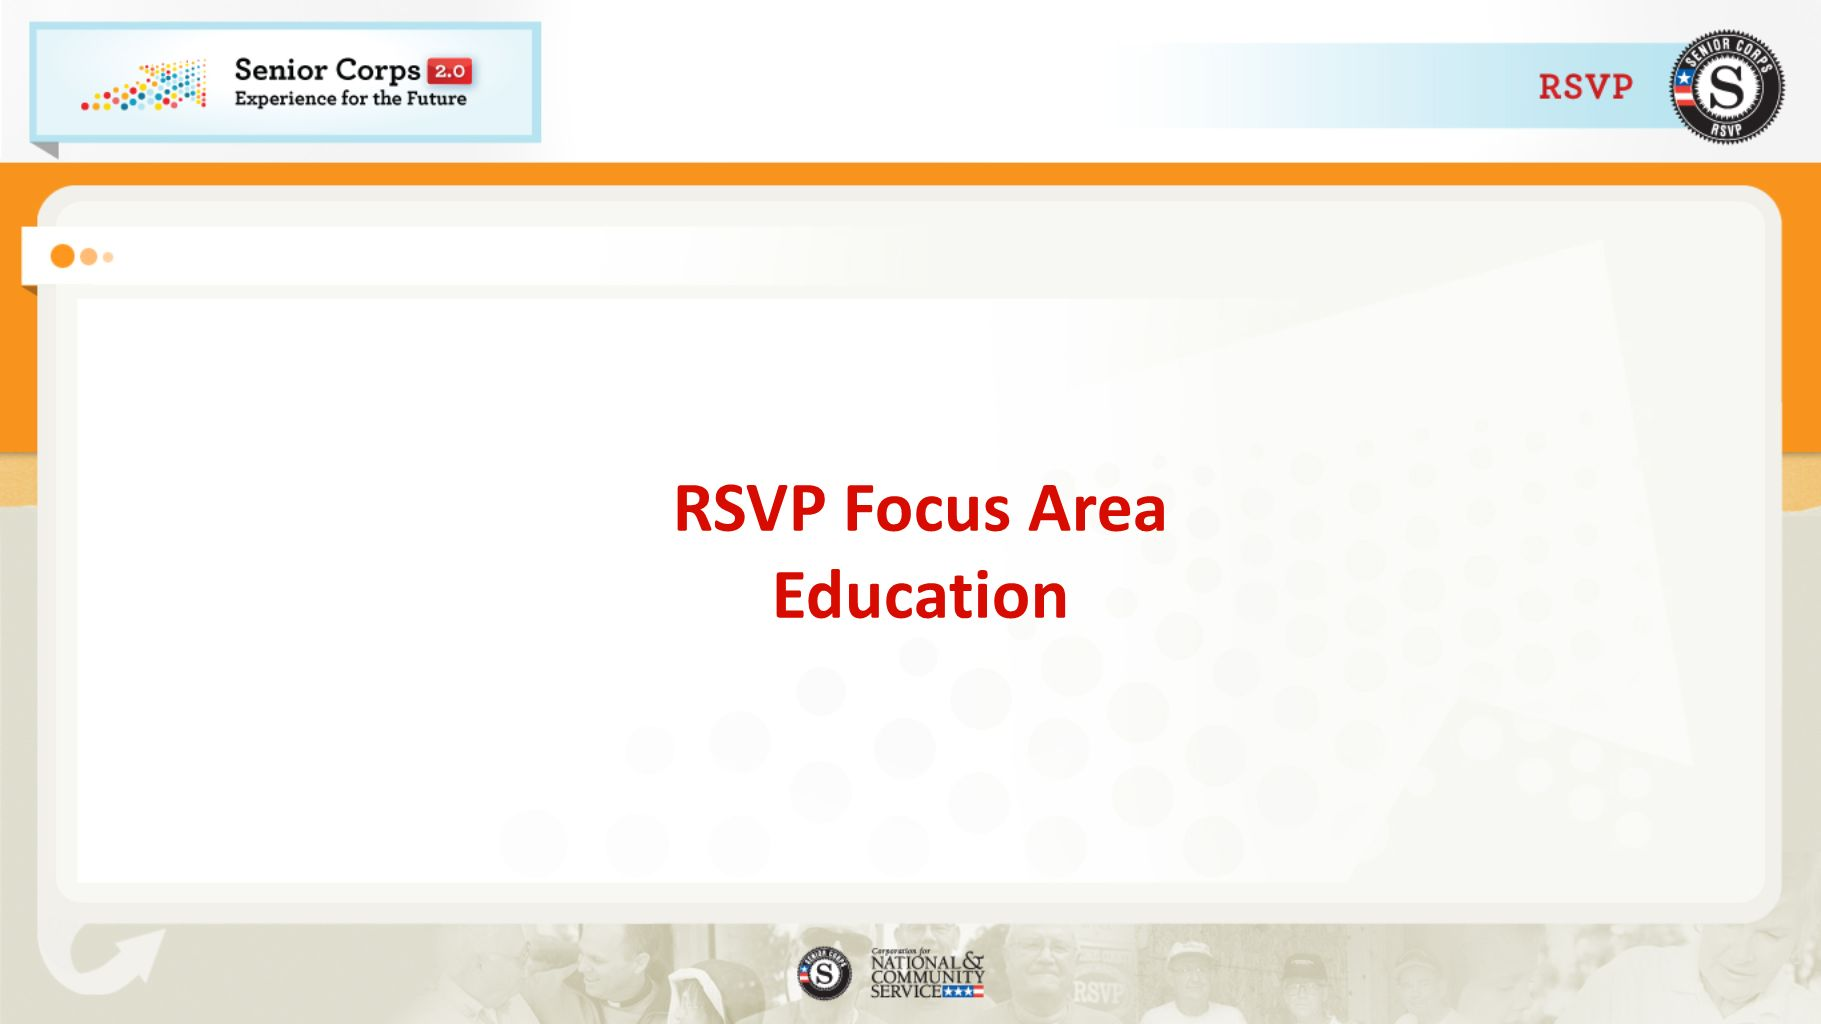 RSVP Focus Area Education